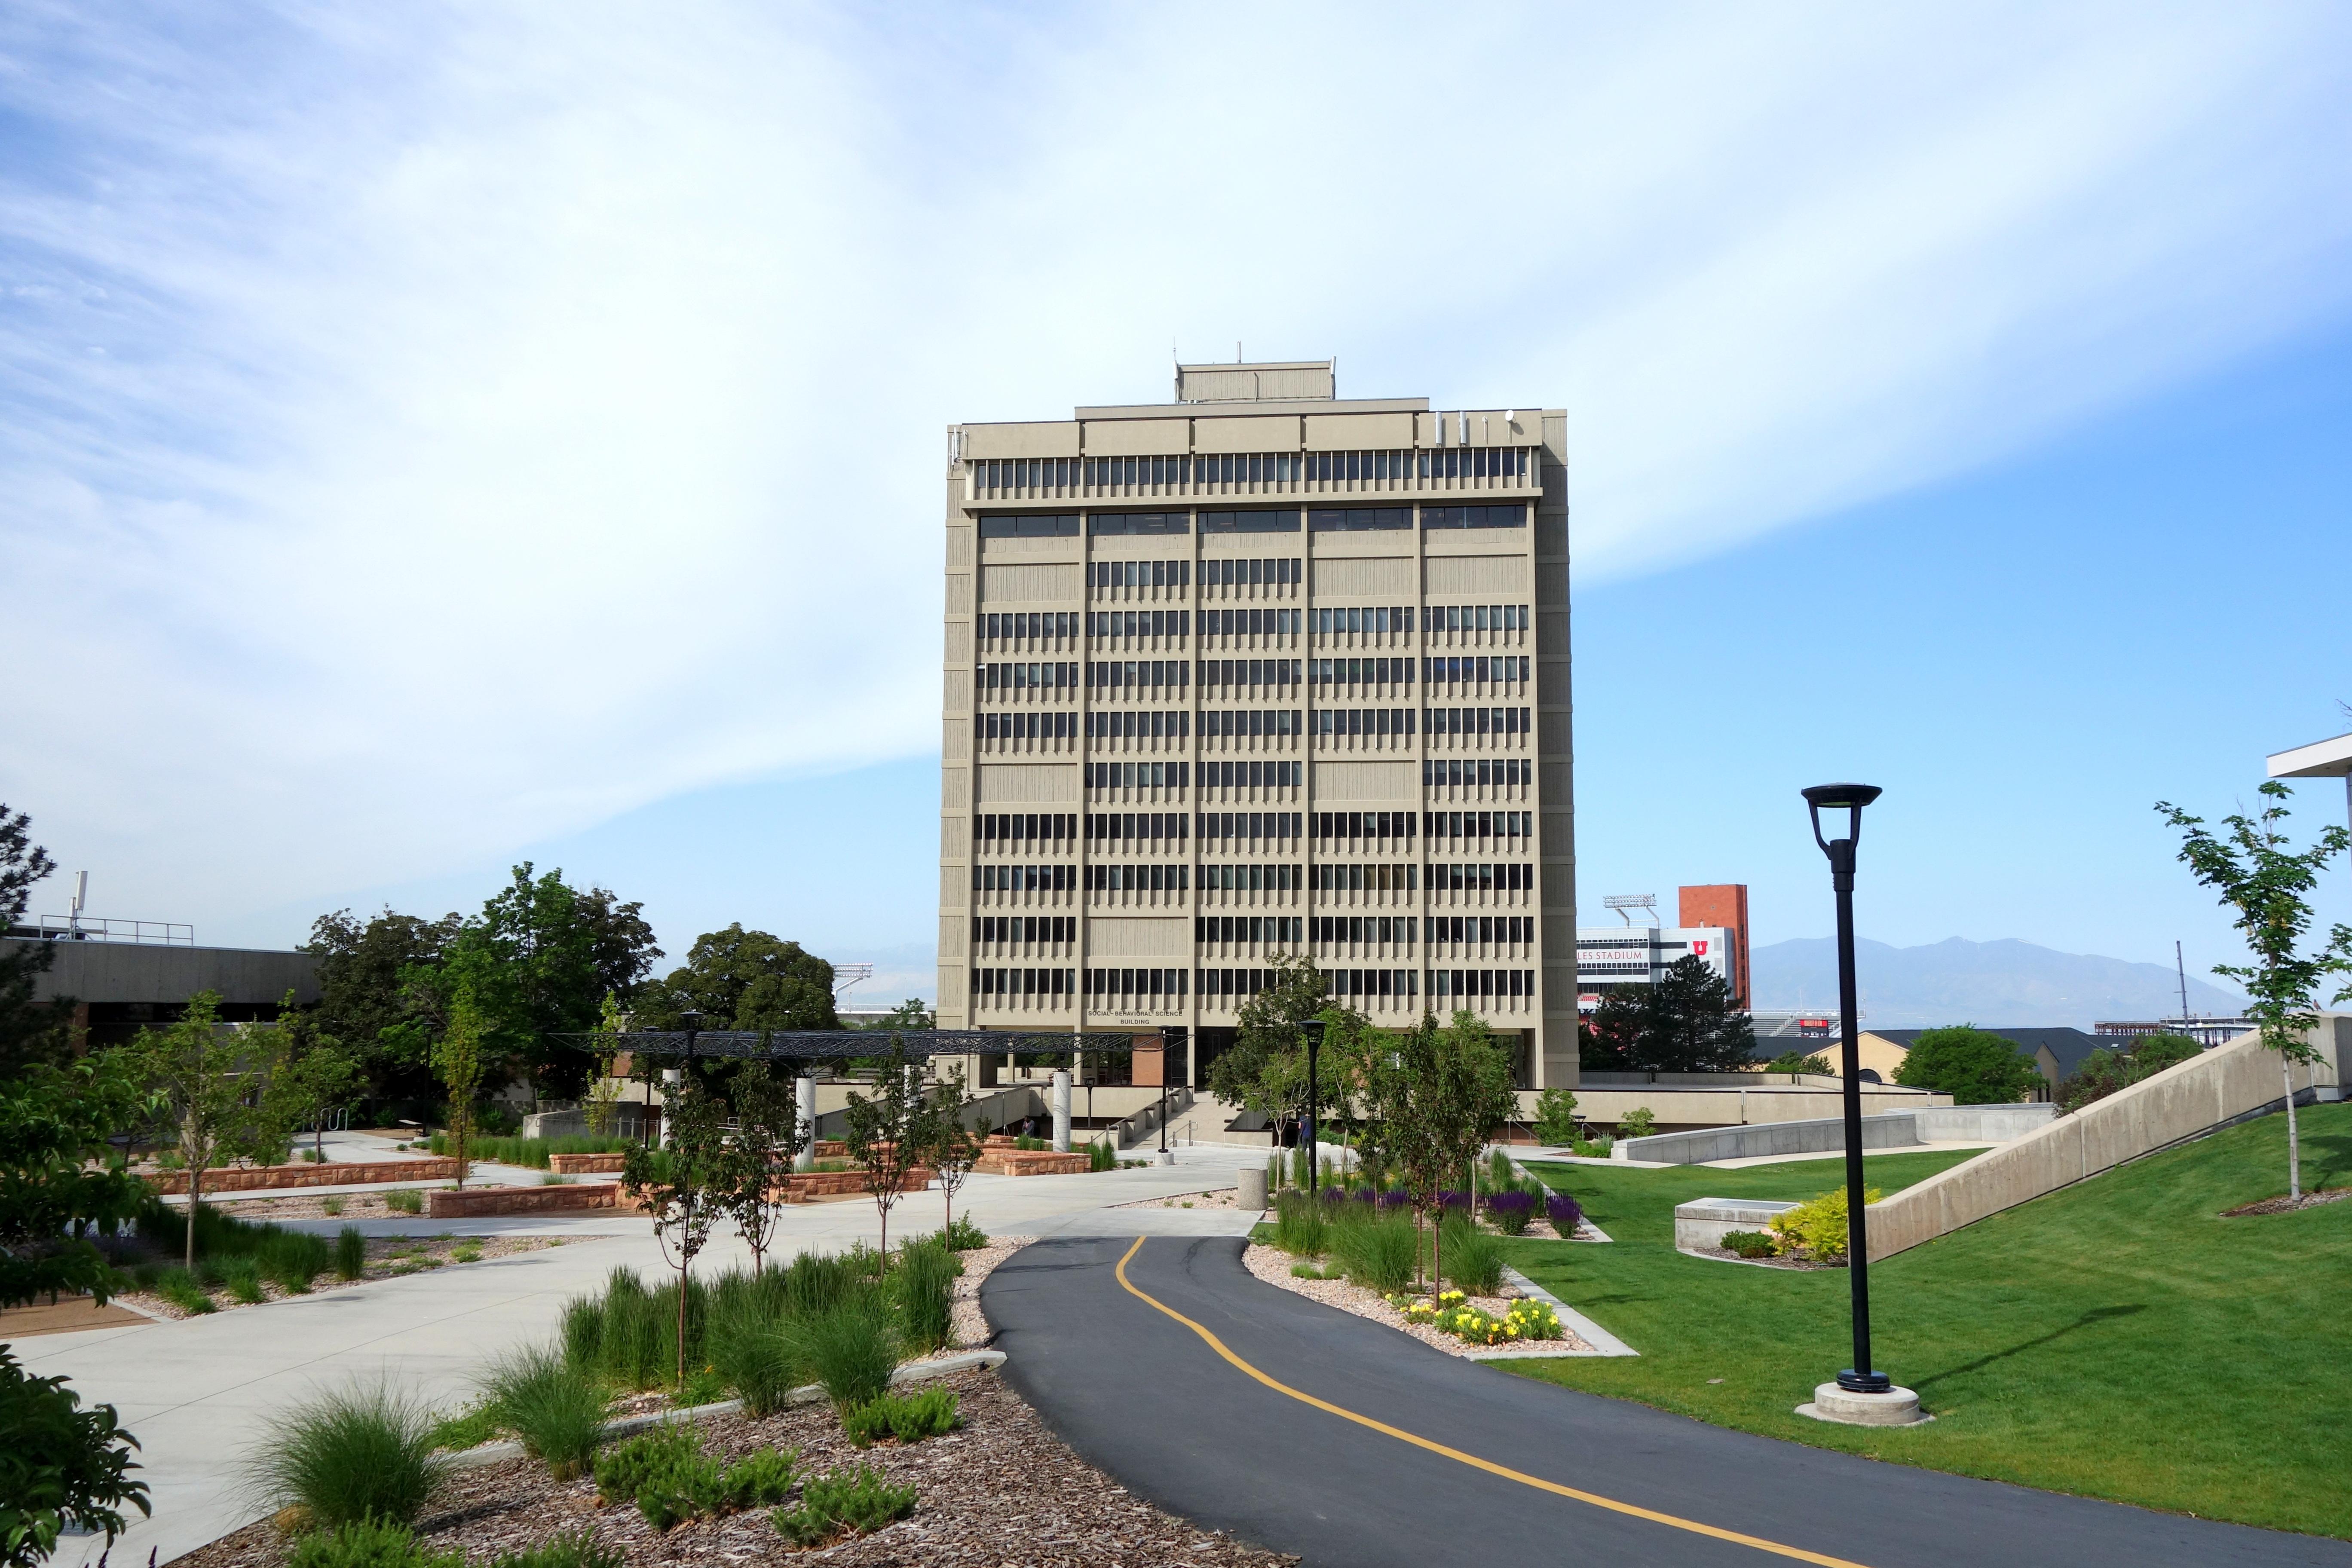 https://upload.wikimedia.org/wikipedia/commons/9/9e/University_of_Utah_Social_and_Behavioral_Sciences_Building_-_University_of_Utah_-_DSC02423.JPG